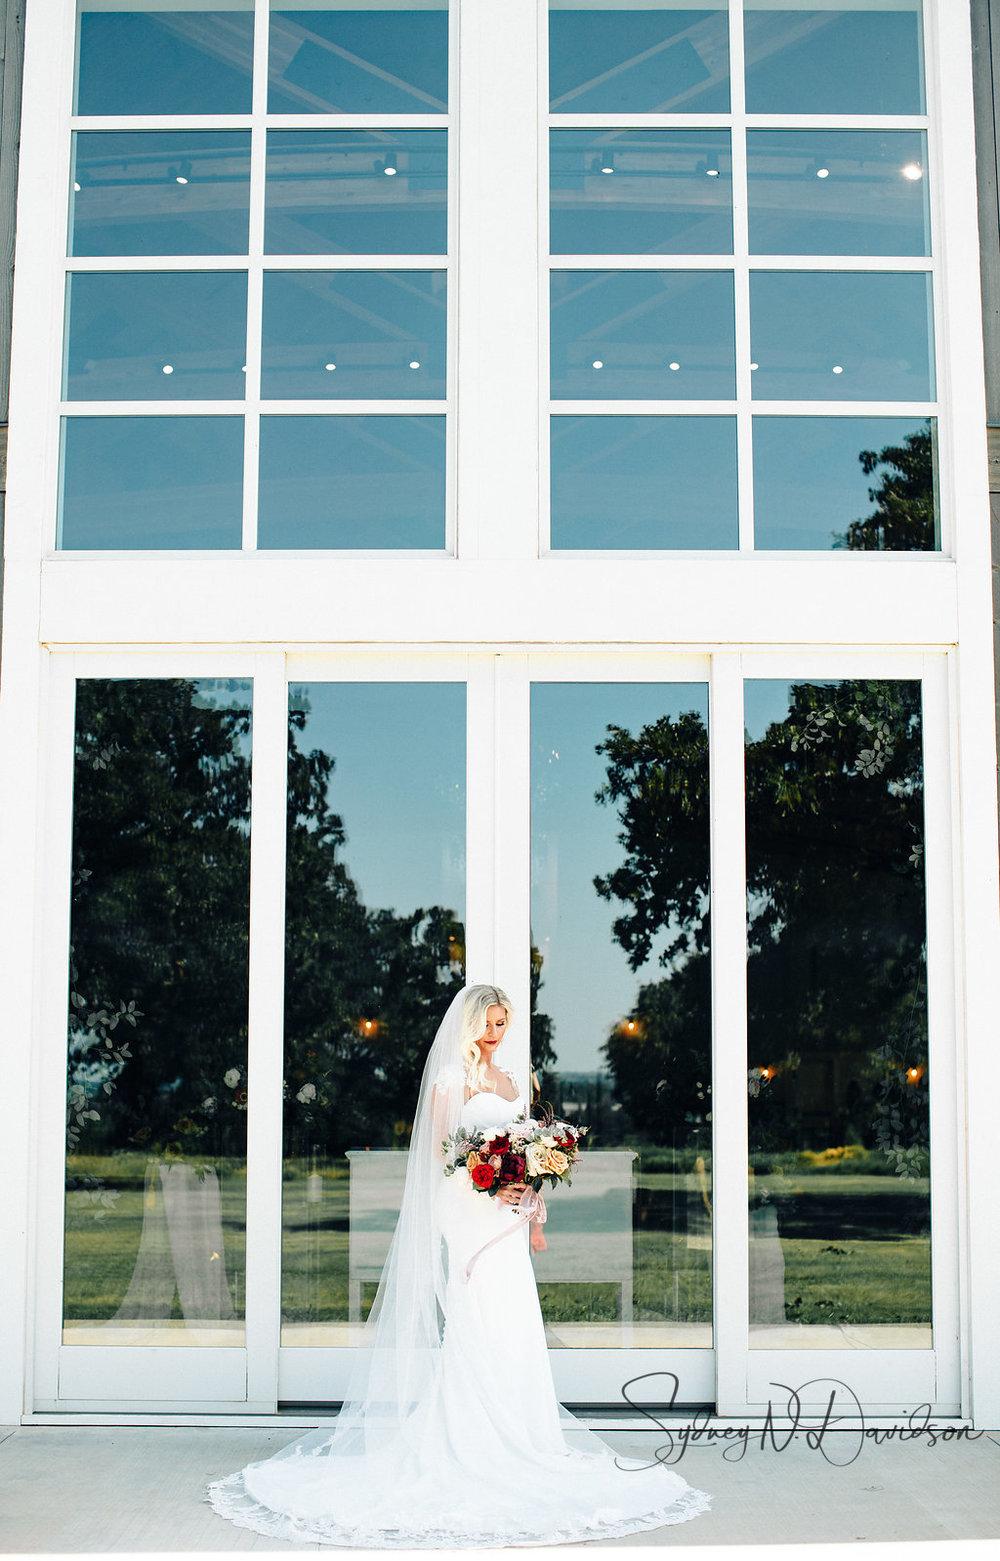 sydney-davidson-wedding-stillwater-oklahoma-wedding-session-traveling-photographer-portrait-tulsa-oklahoma-2447.jpg